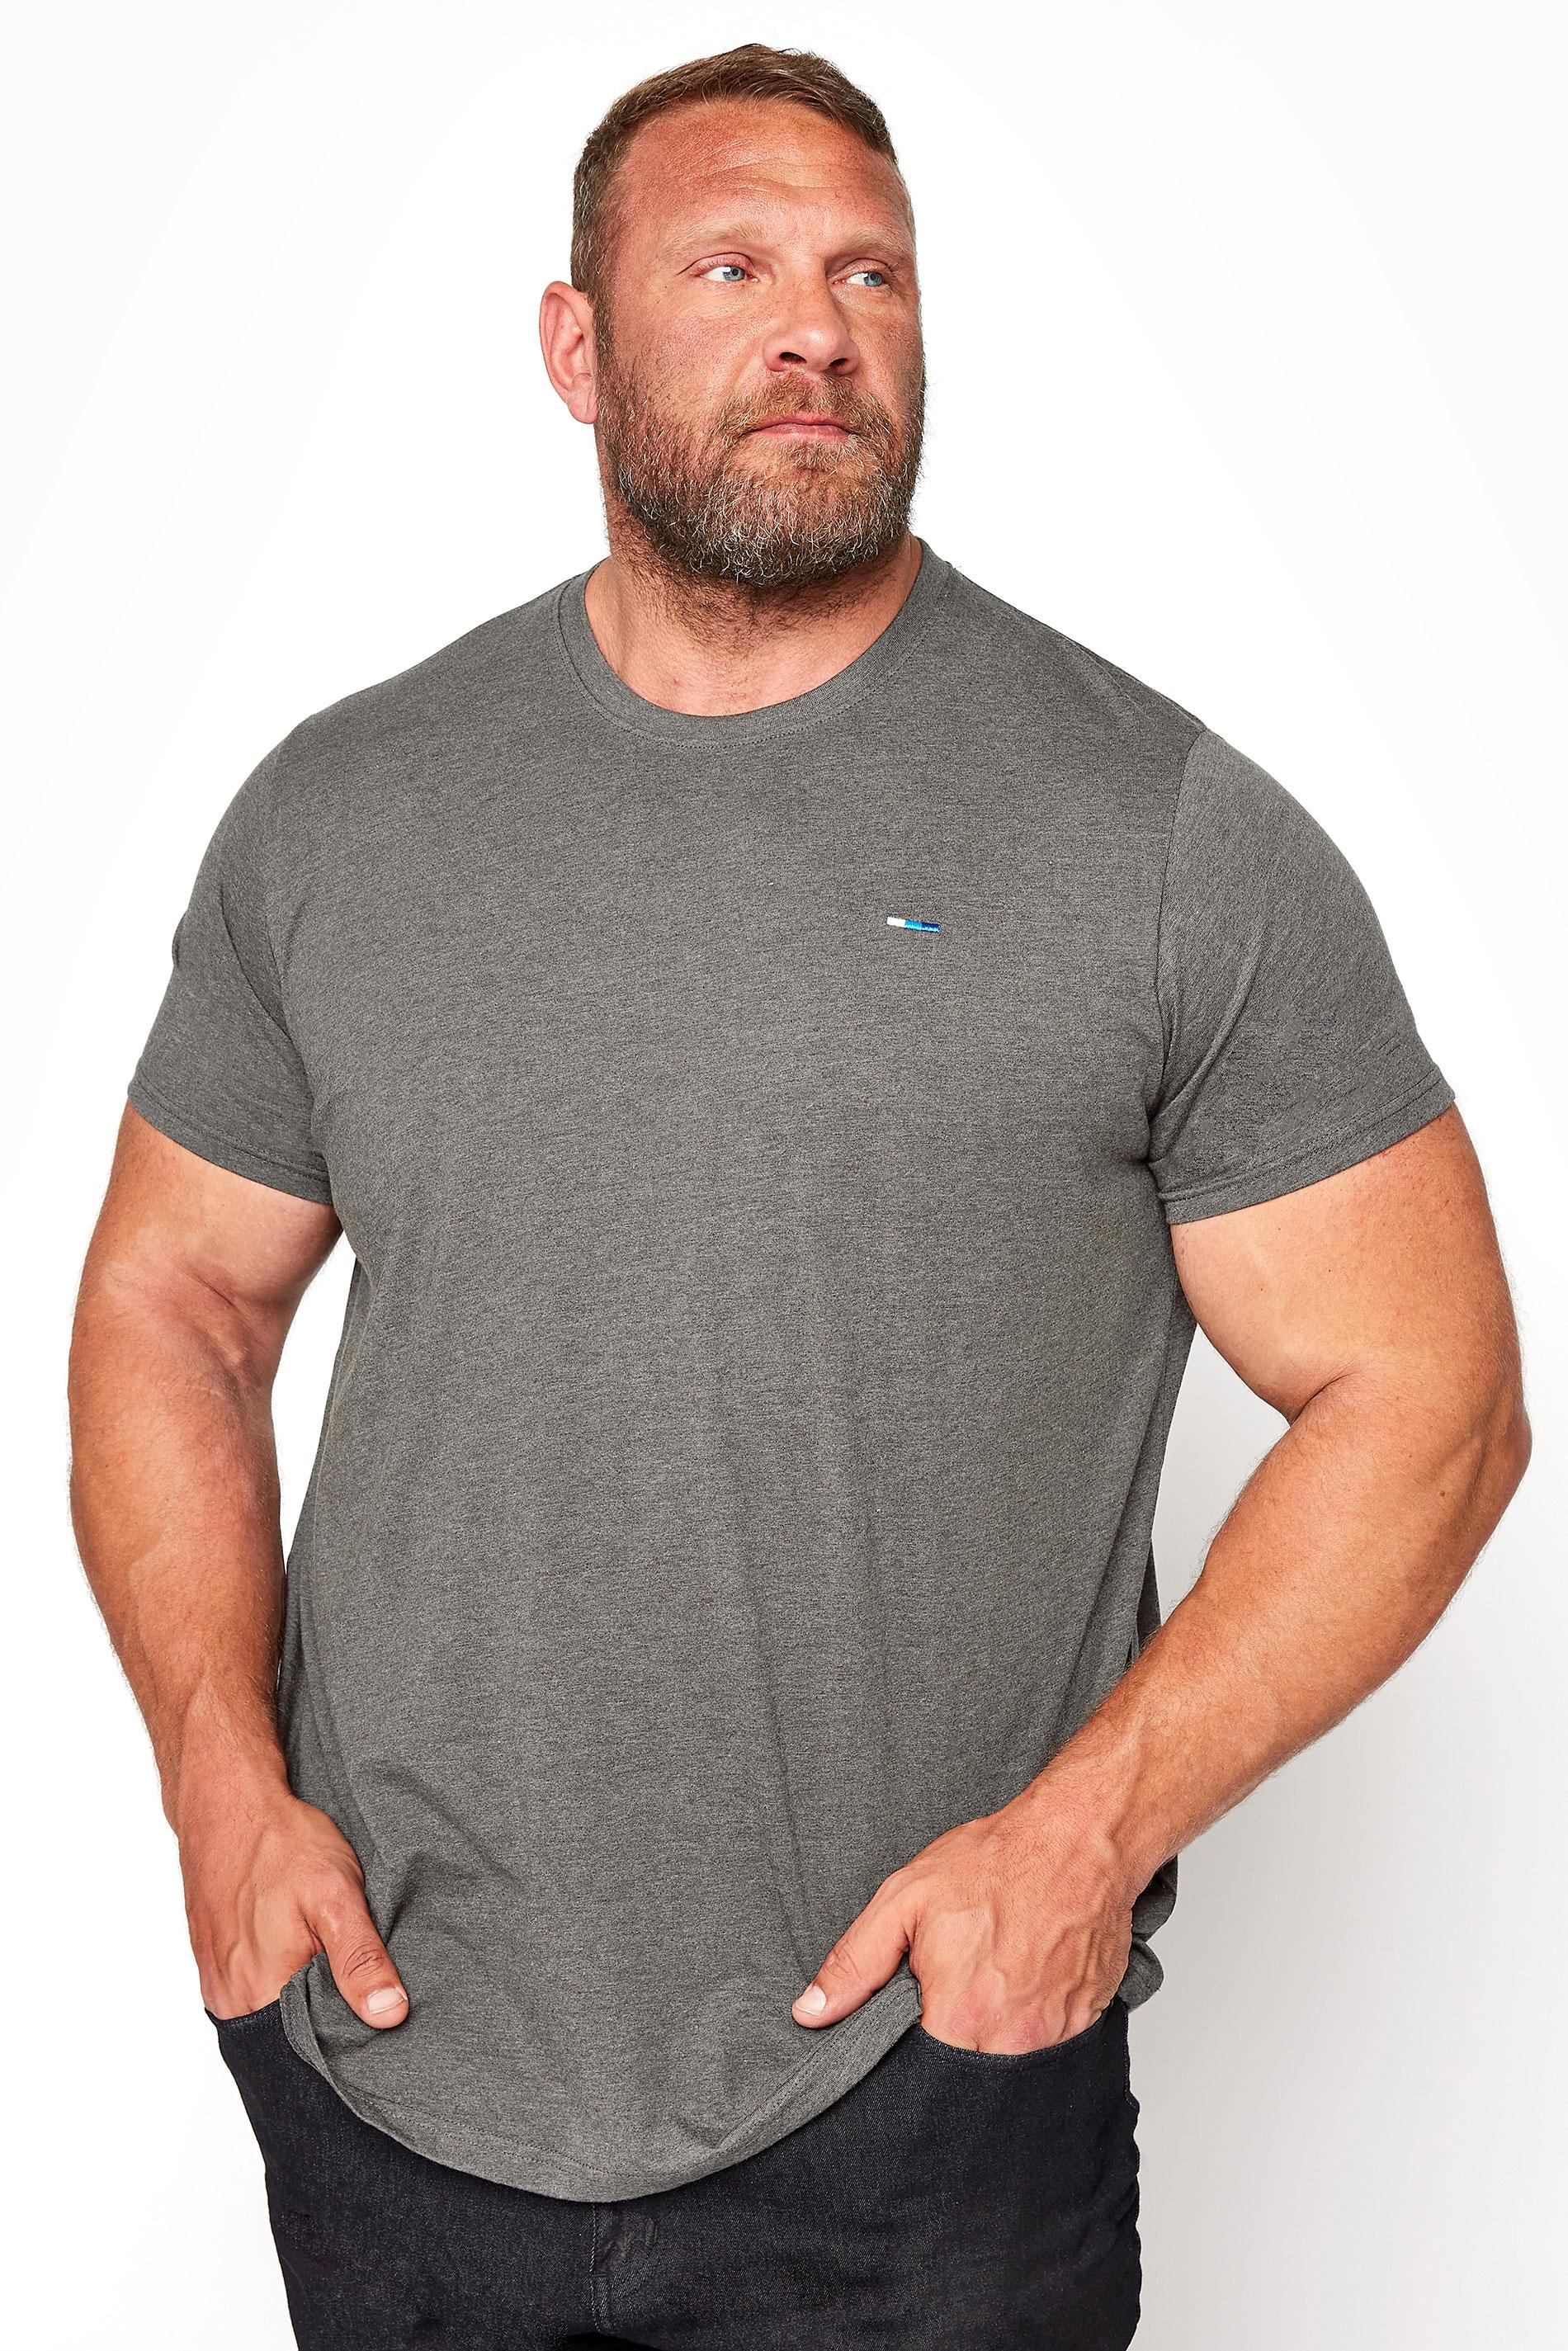 BadRhino Charcoal Grey Plain T-Shirt